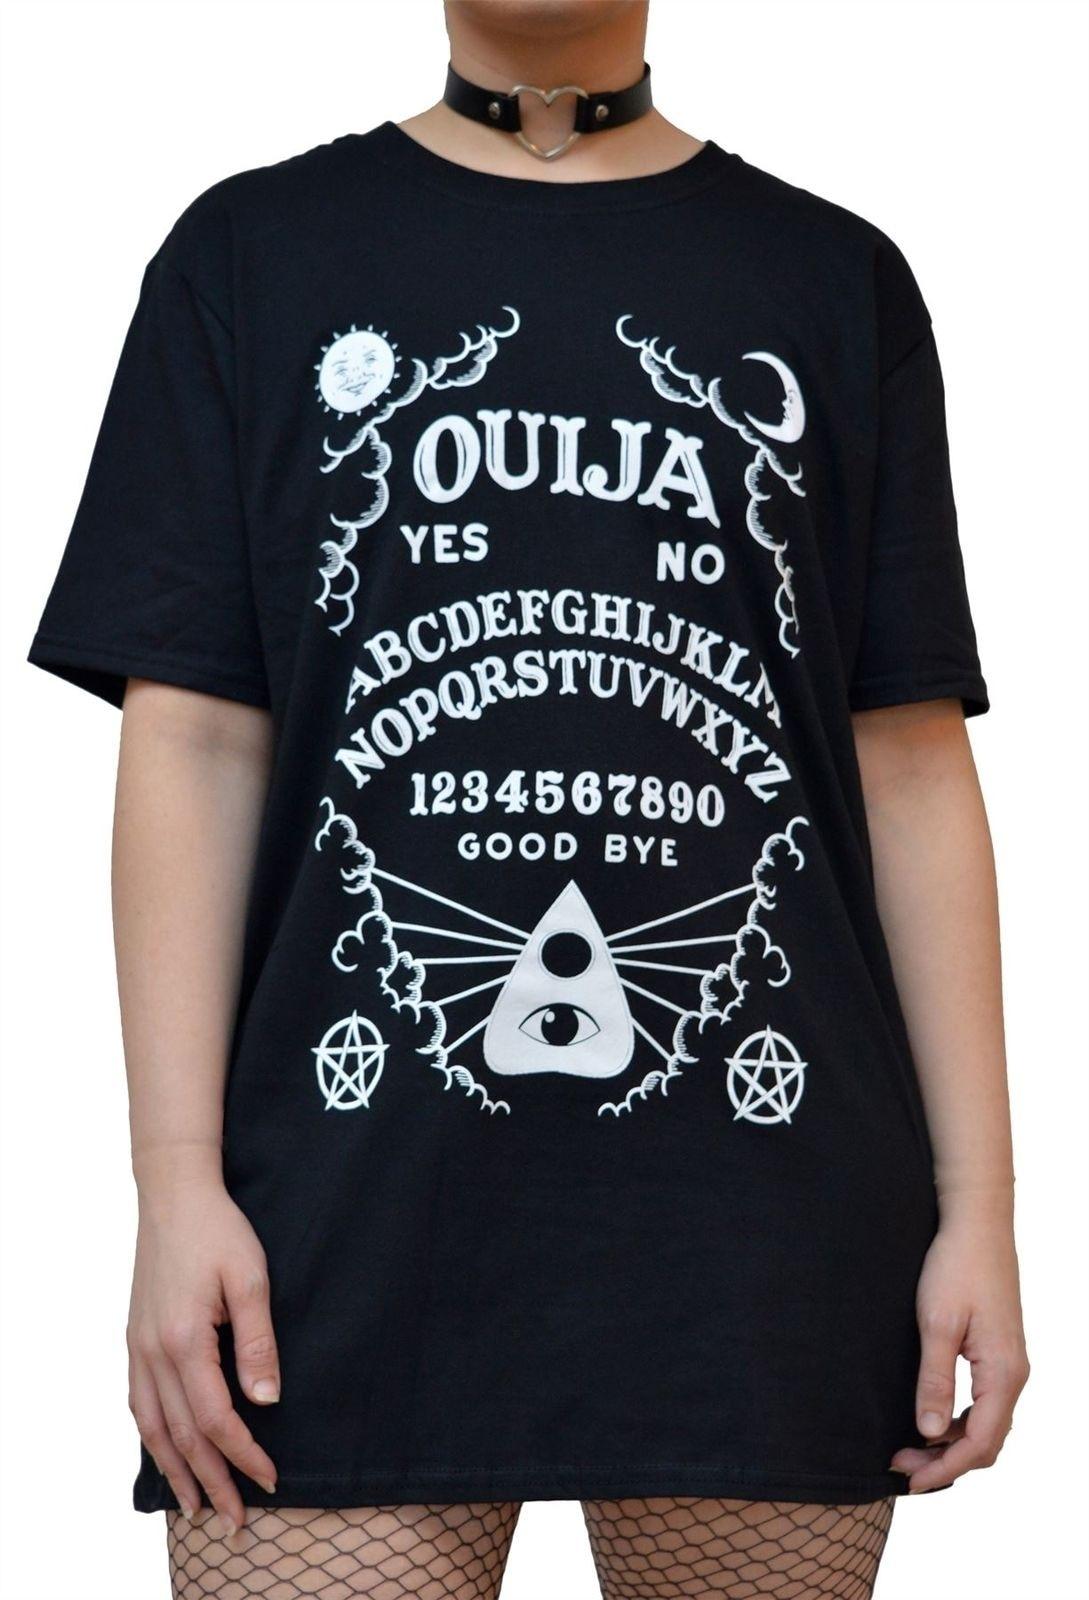 Kuakuayu HJN Ouija Board Women Gothic Black T-Shirt Grunge Swag Oversized Graphic Tee Halloween Clothing